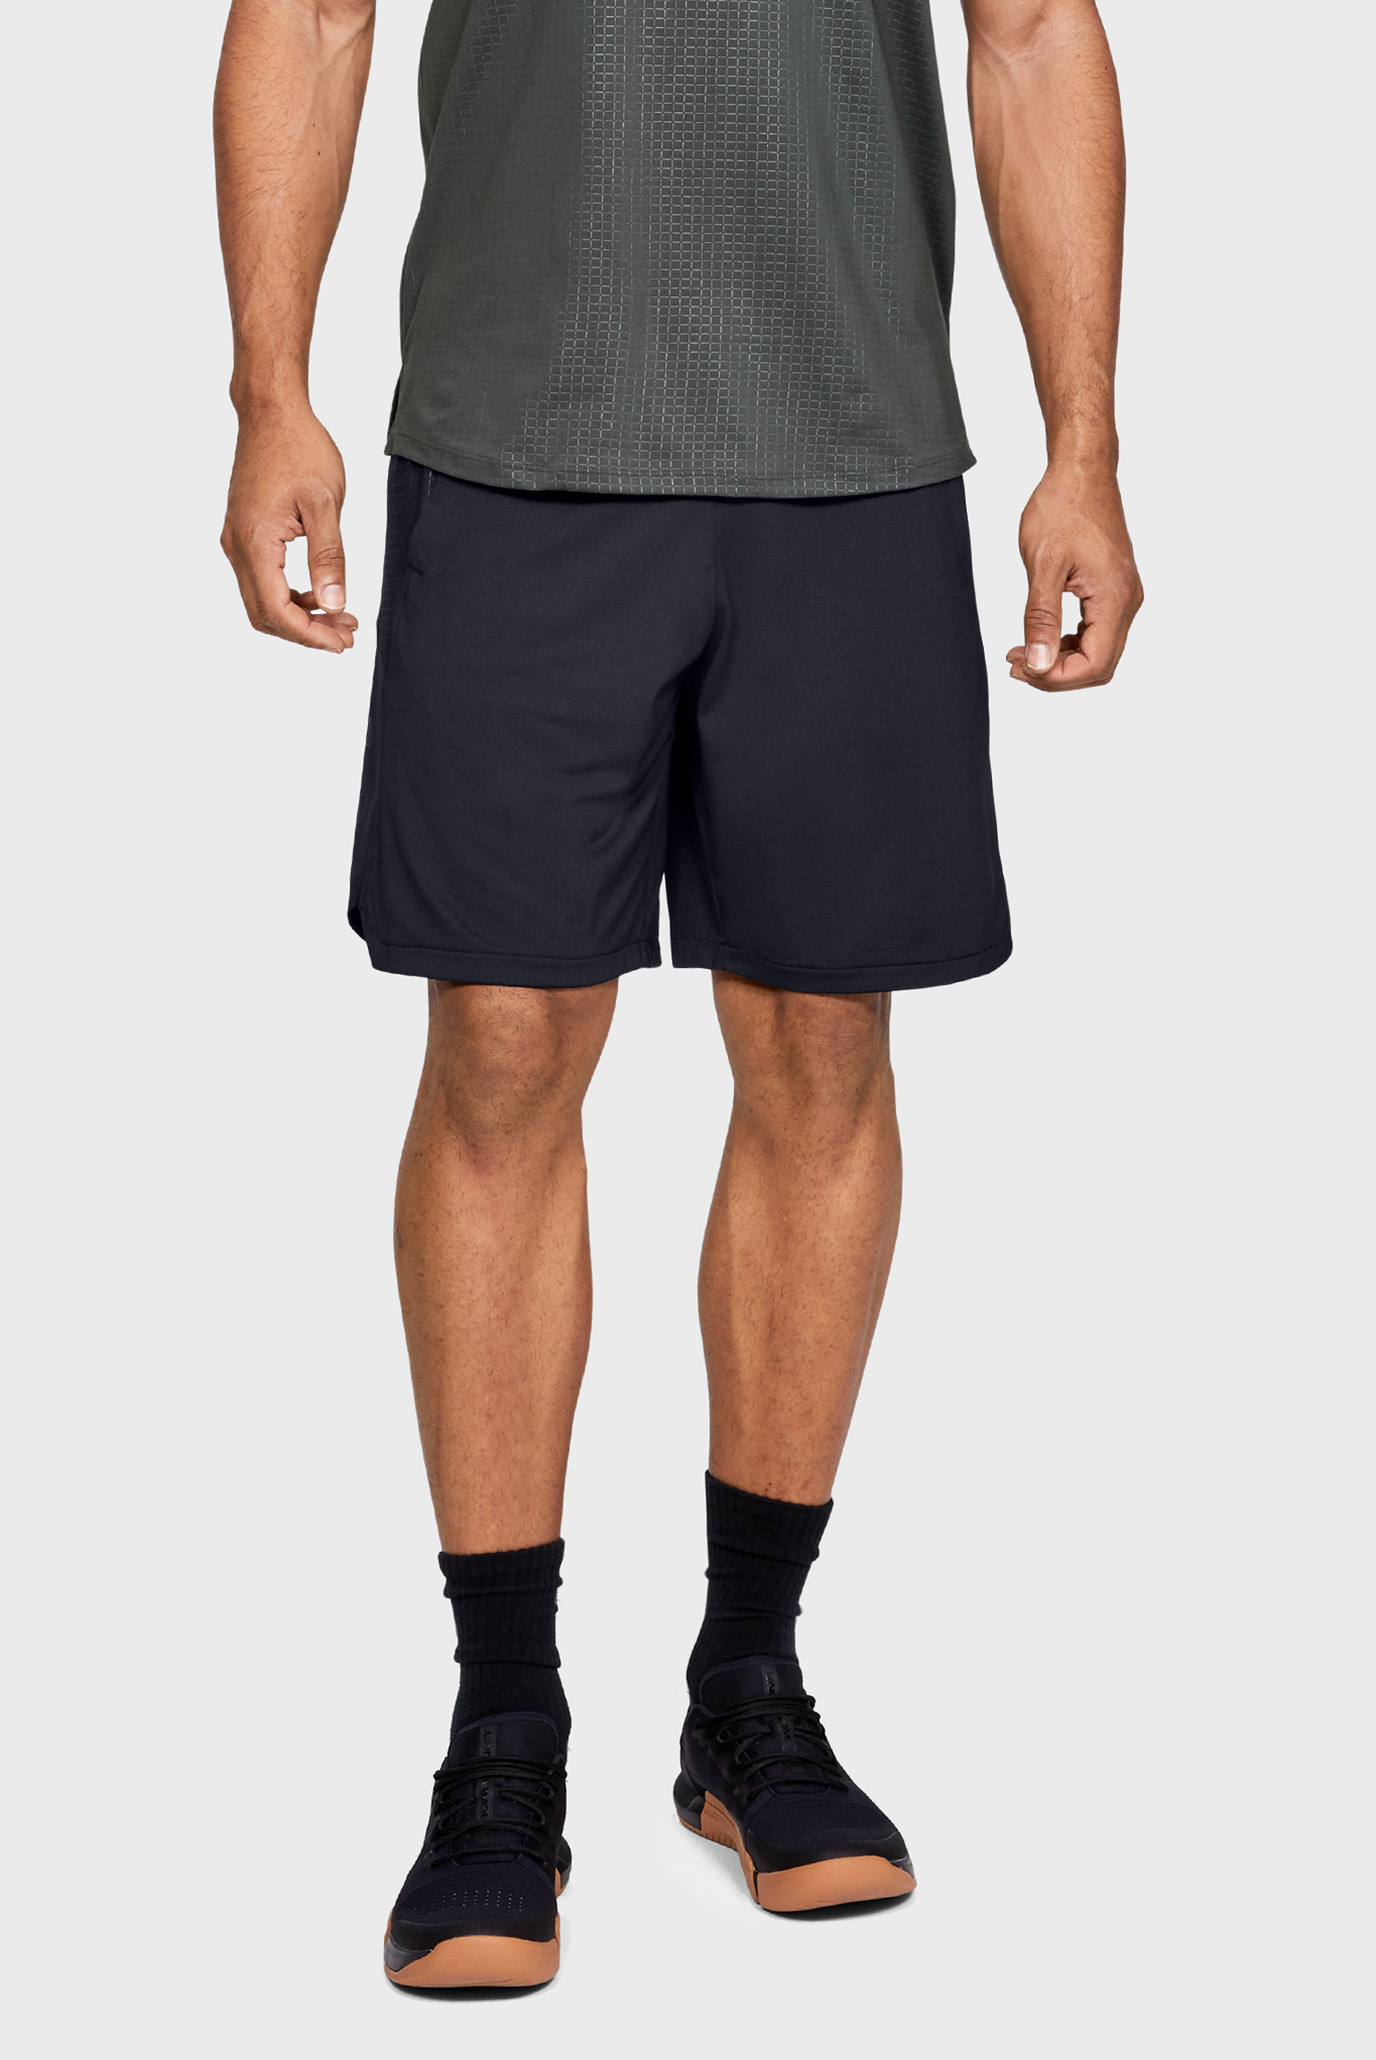 Мужские черные шорты MK1 Short Emboss Under Armour